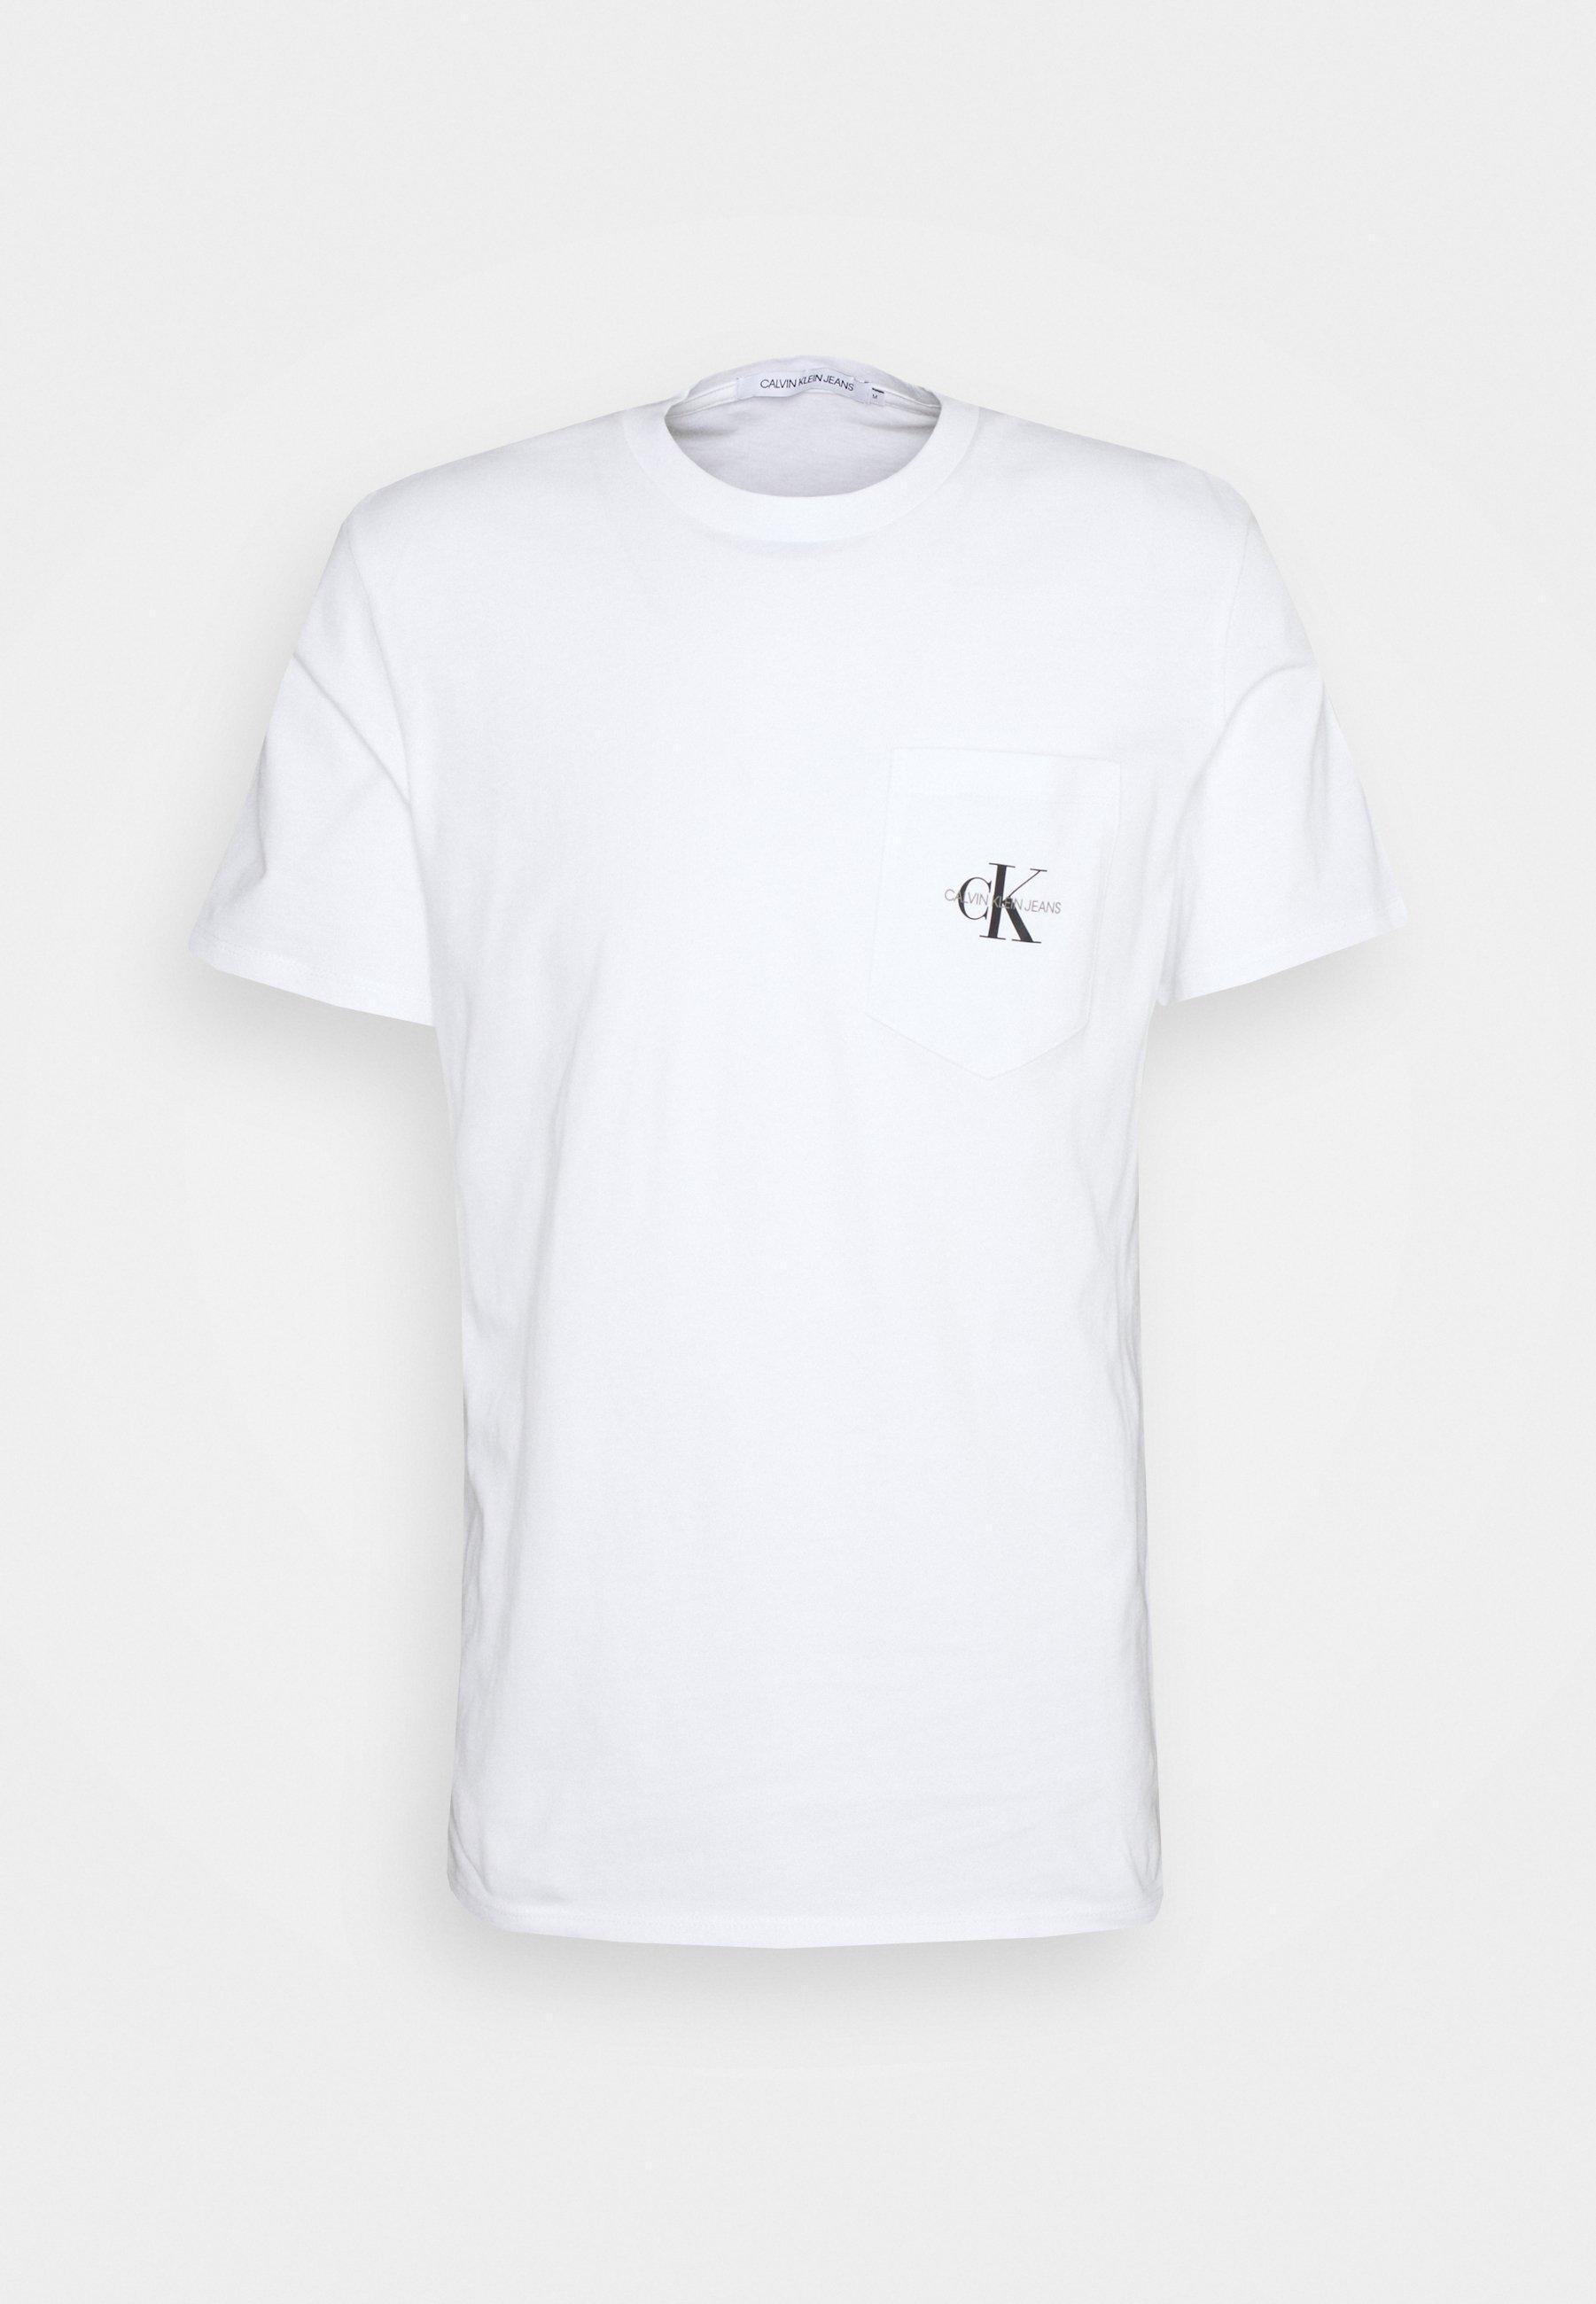 Homme MONOGRAM POCKET TEE - T-shirt imprimé